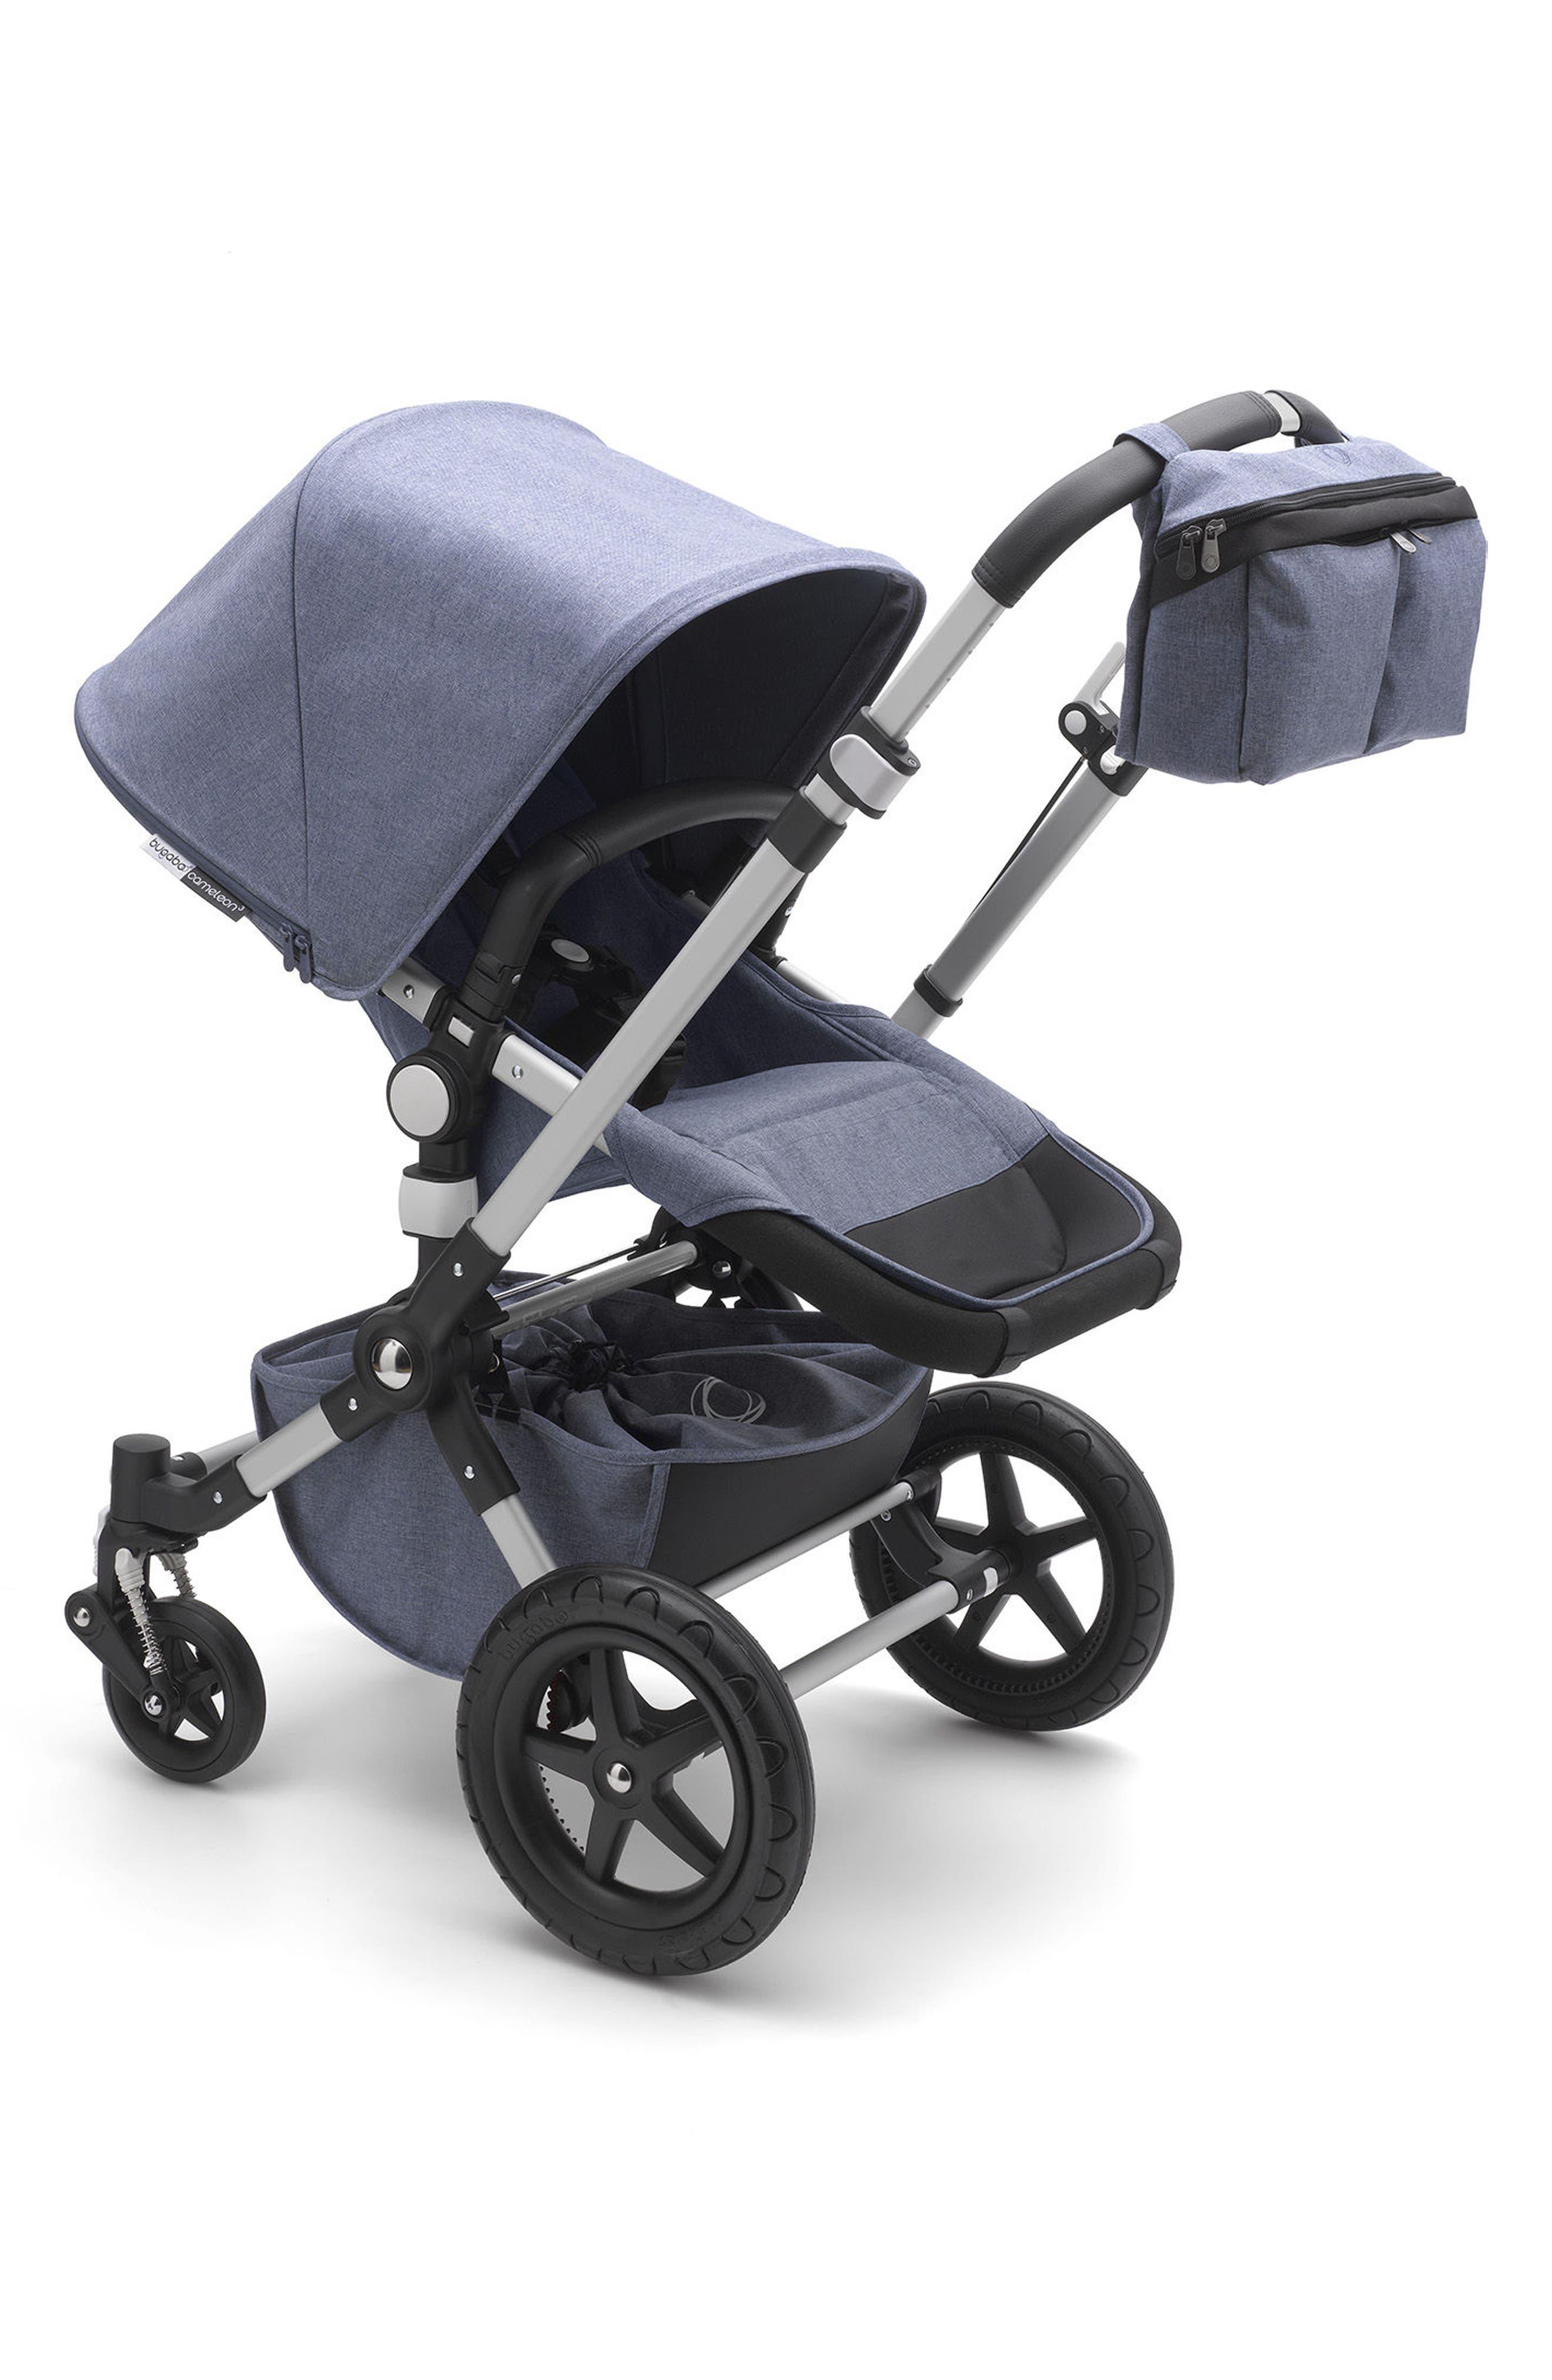 Alternate Image 1 Selected - Bugaboo Cameleon³ Fresh Collection Stroller